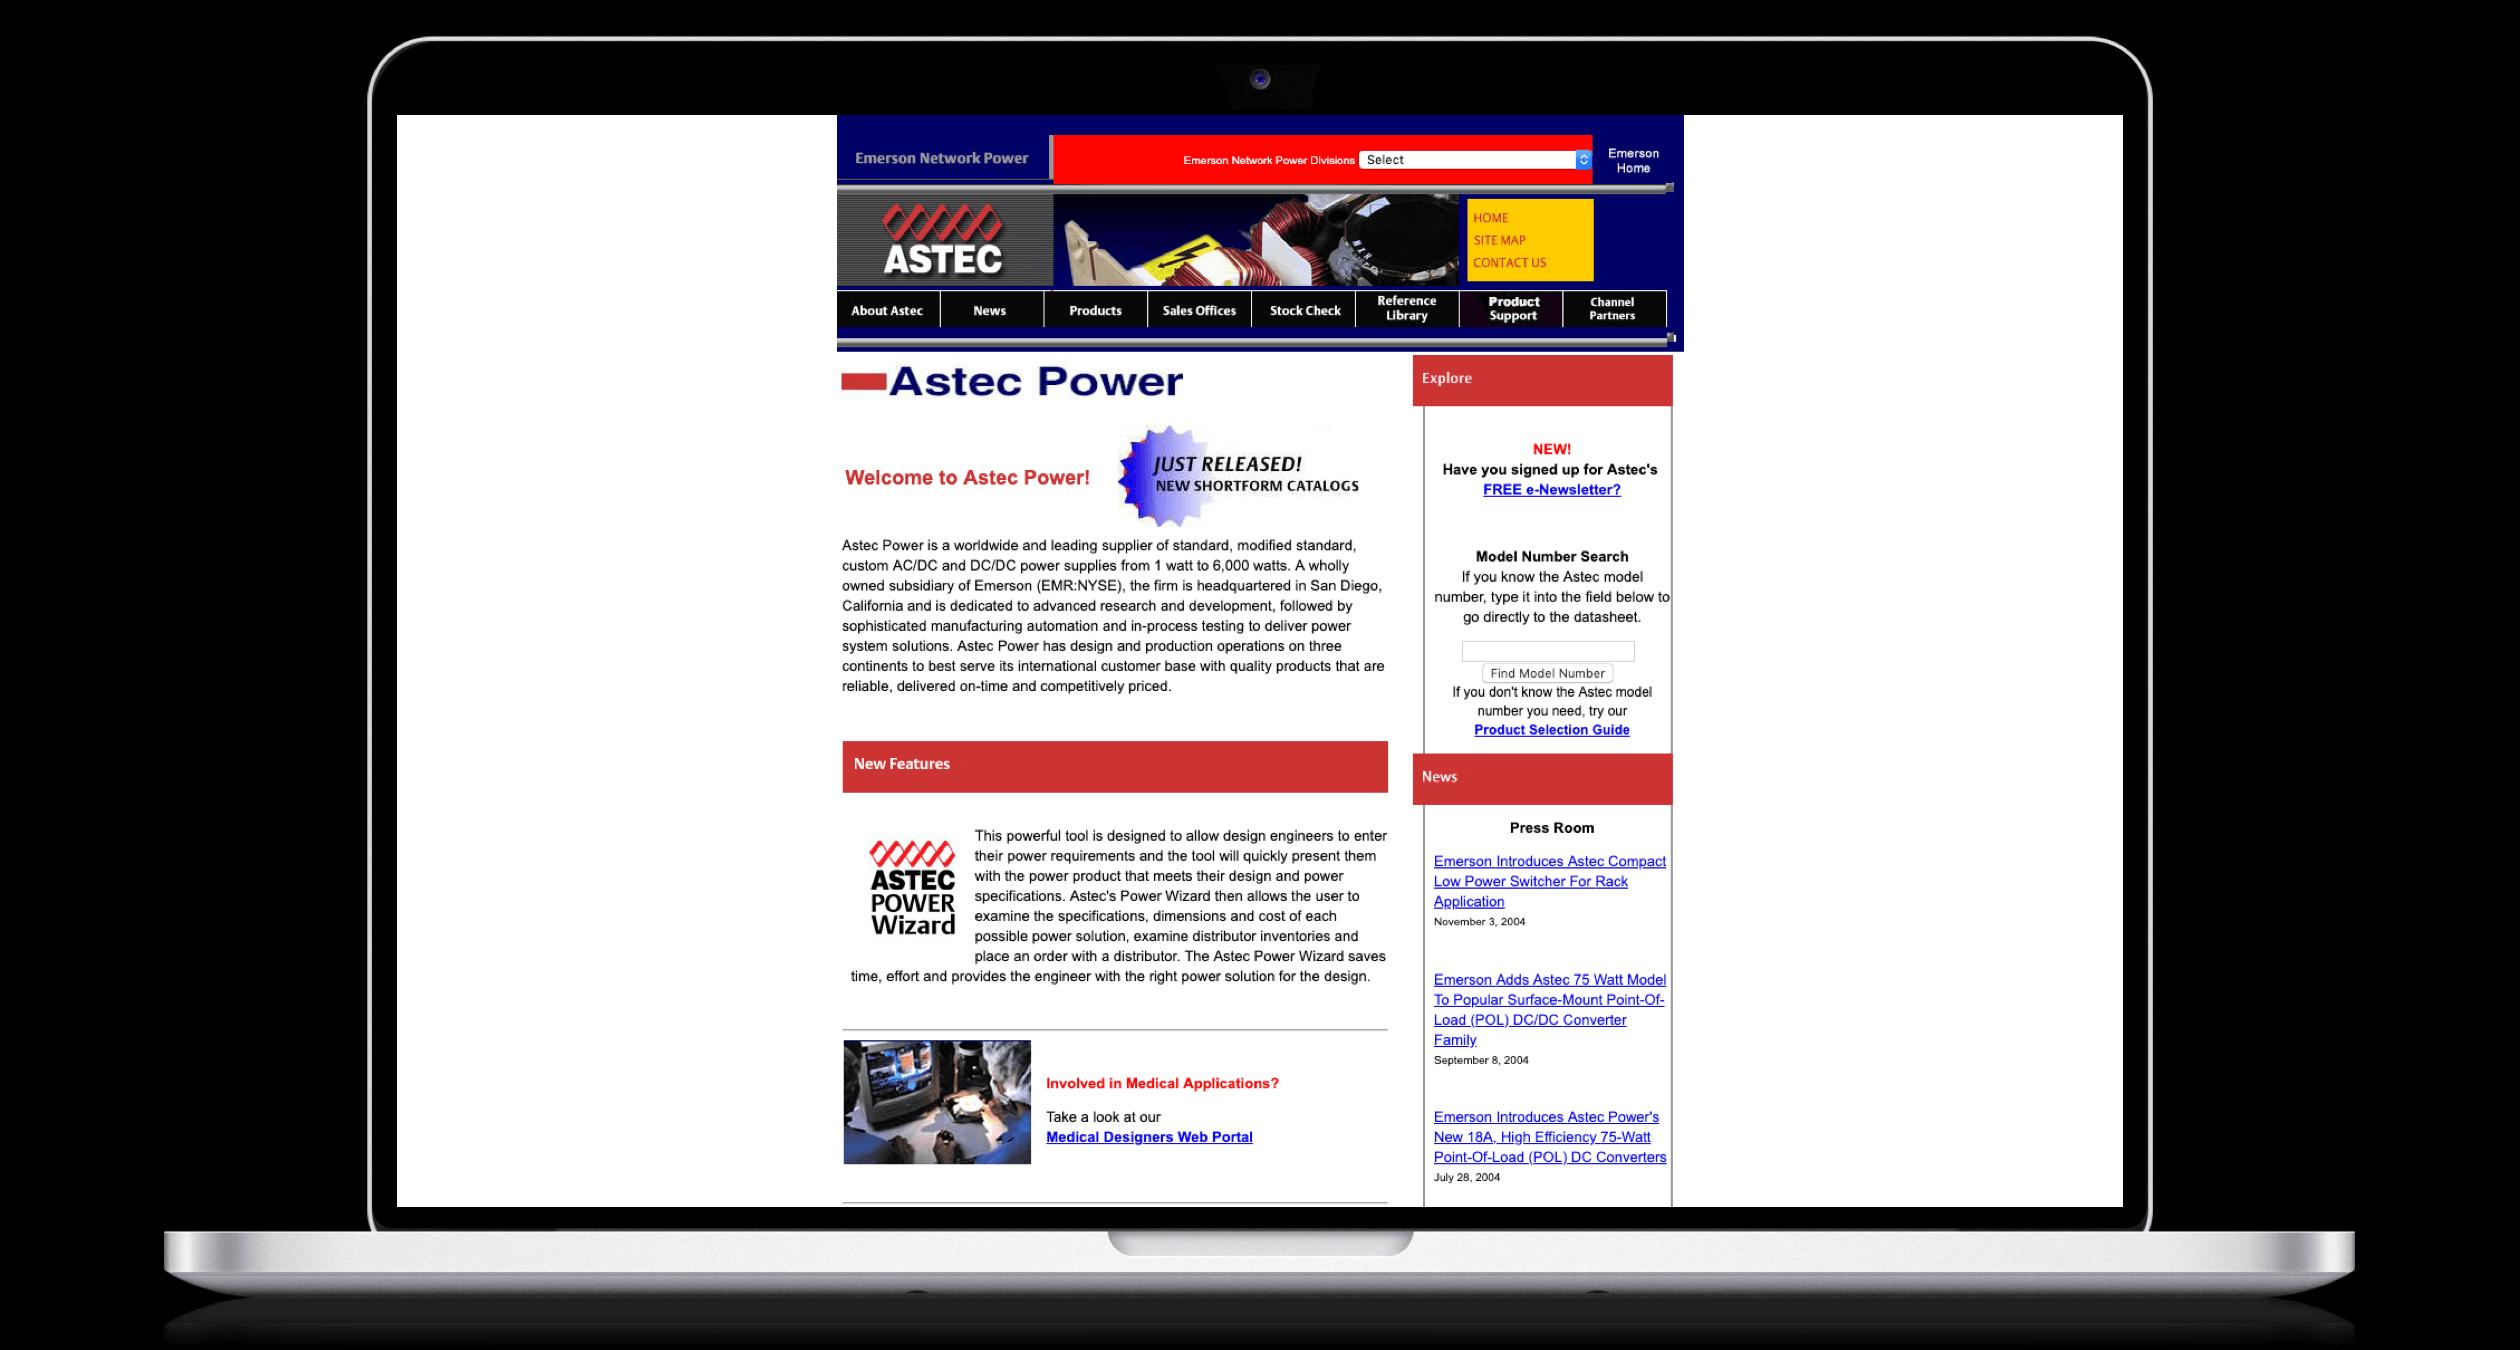 PHX-Web-Agency-Emerson-AC-DC-Power-Supplies-DC-DC-Converters-Website-Design-Before